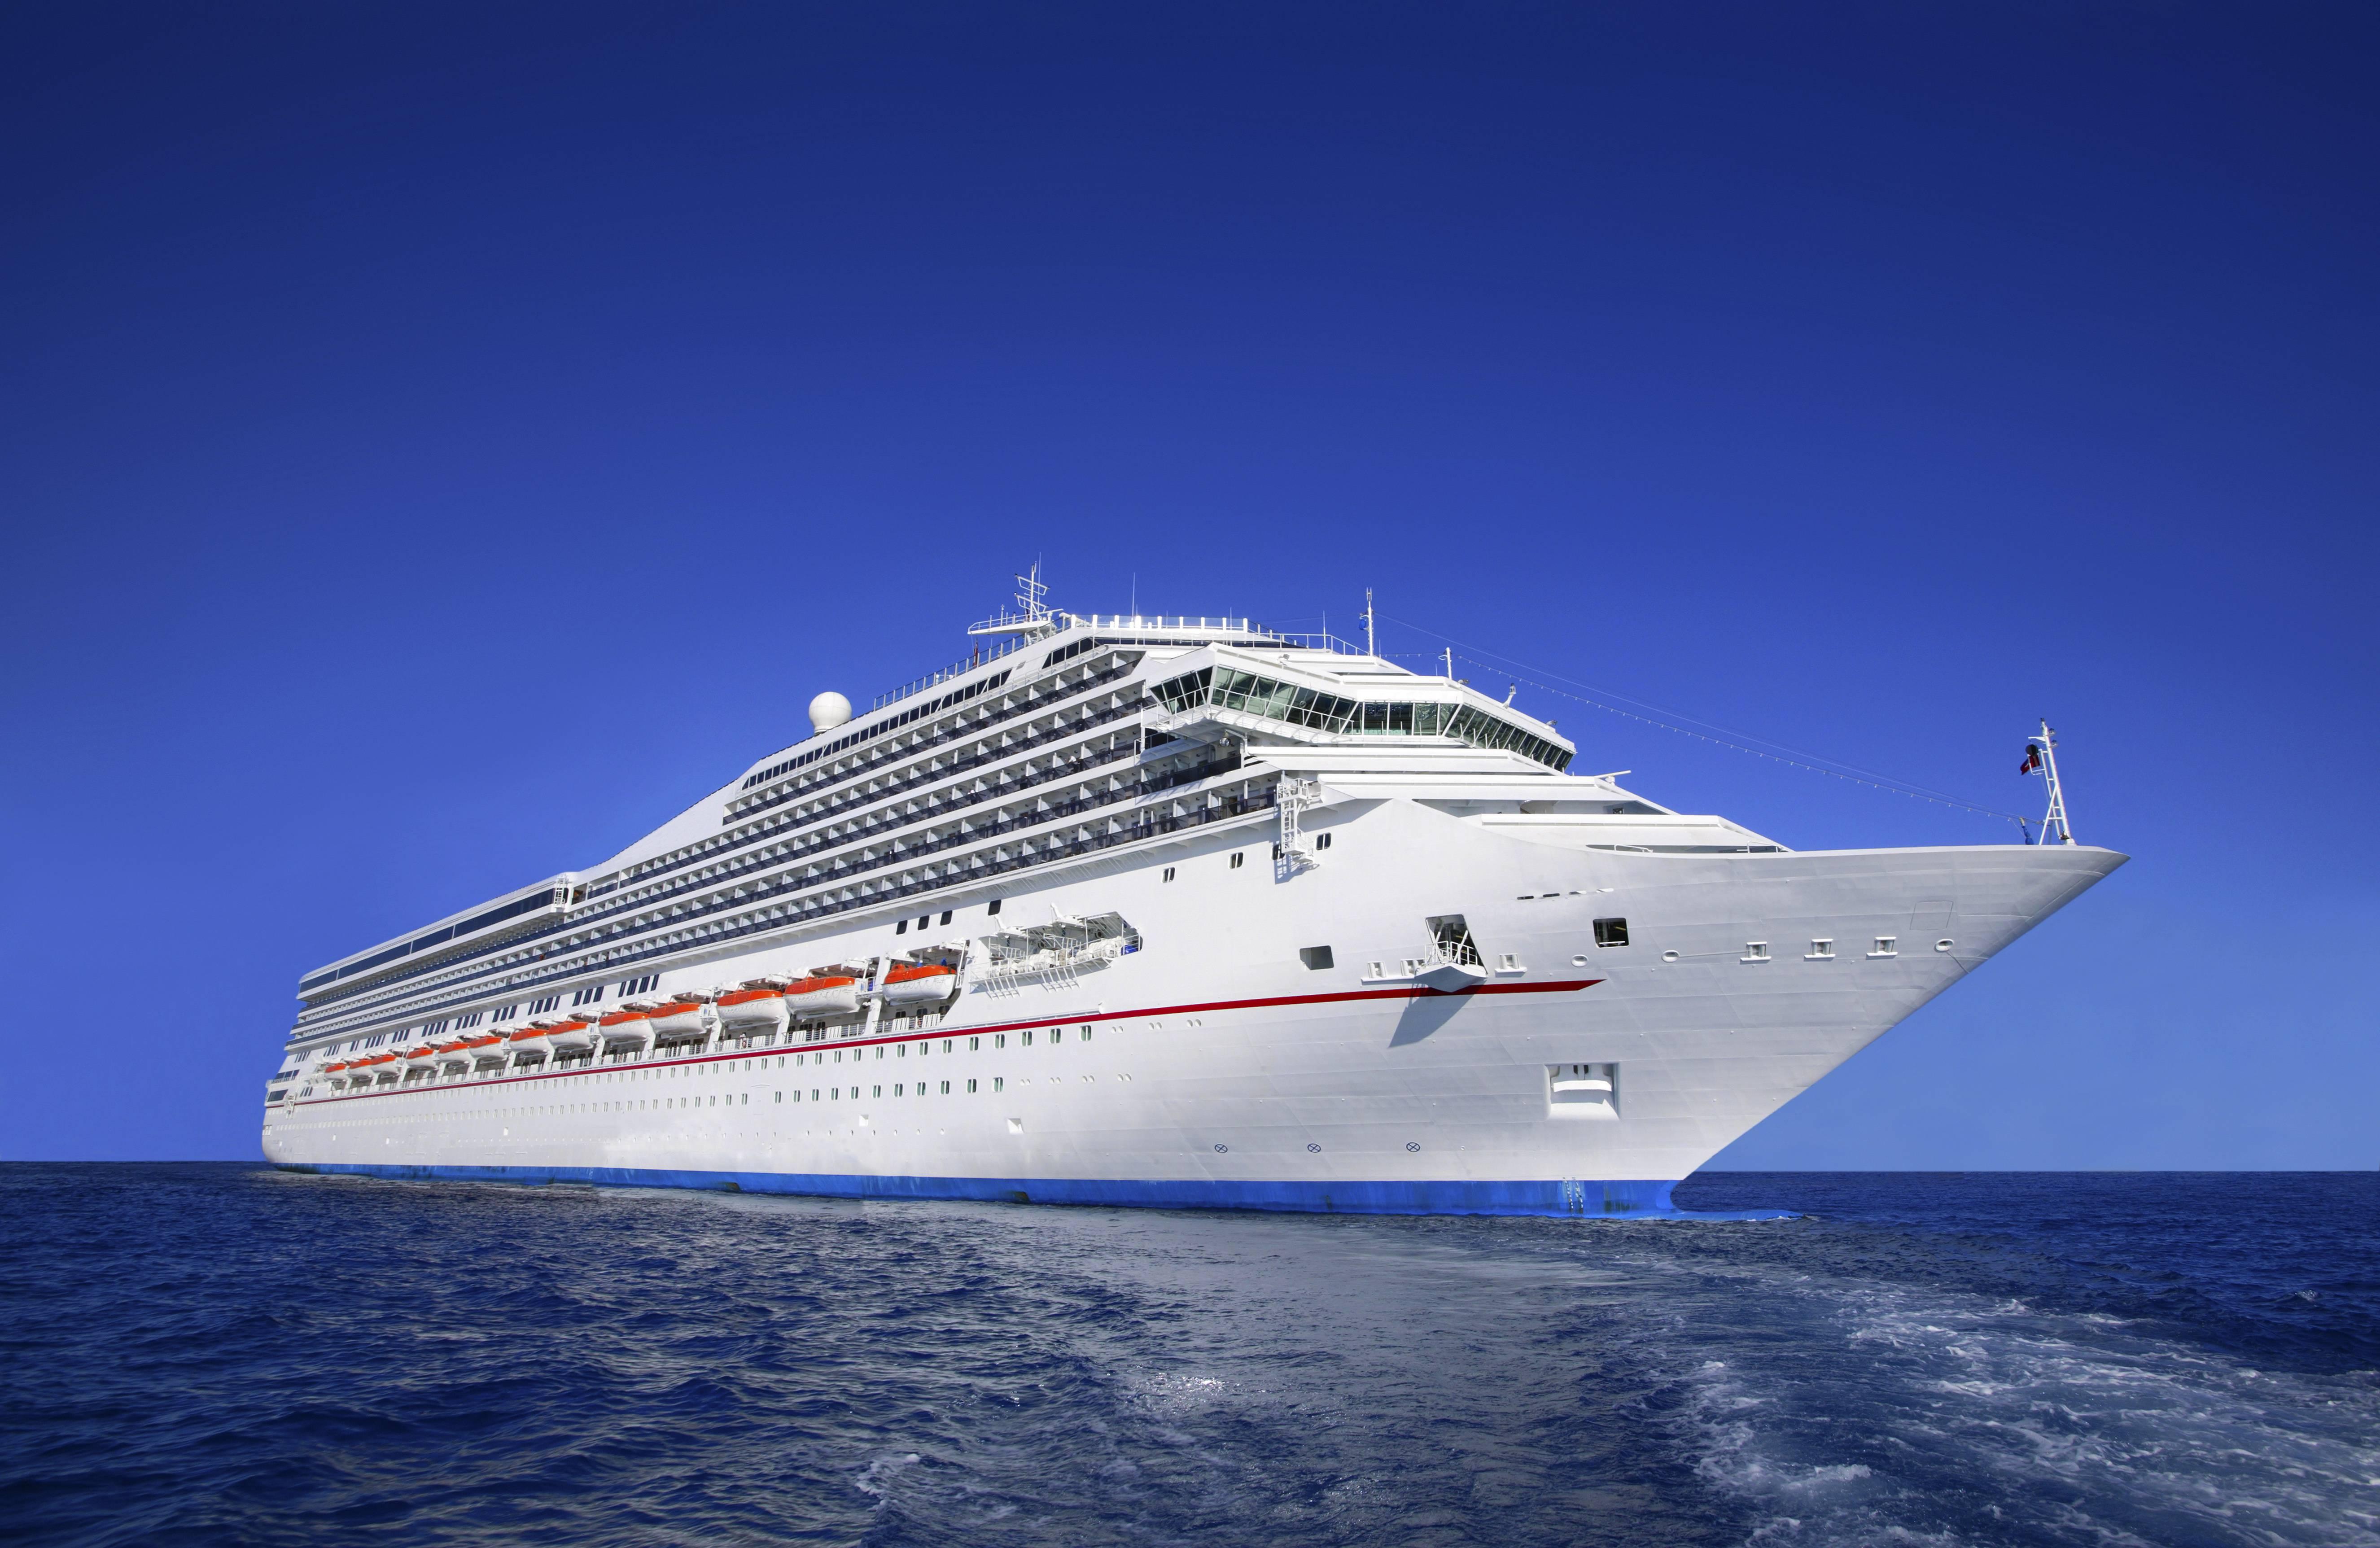 cruise ship wallpaper background - photo #12